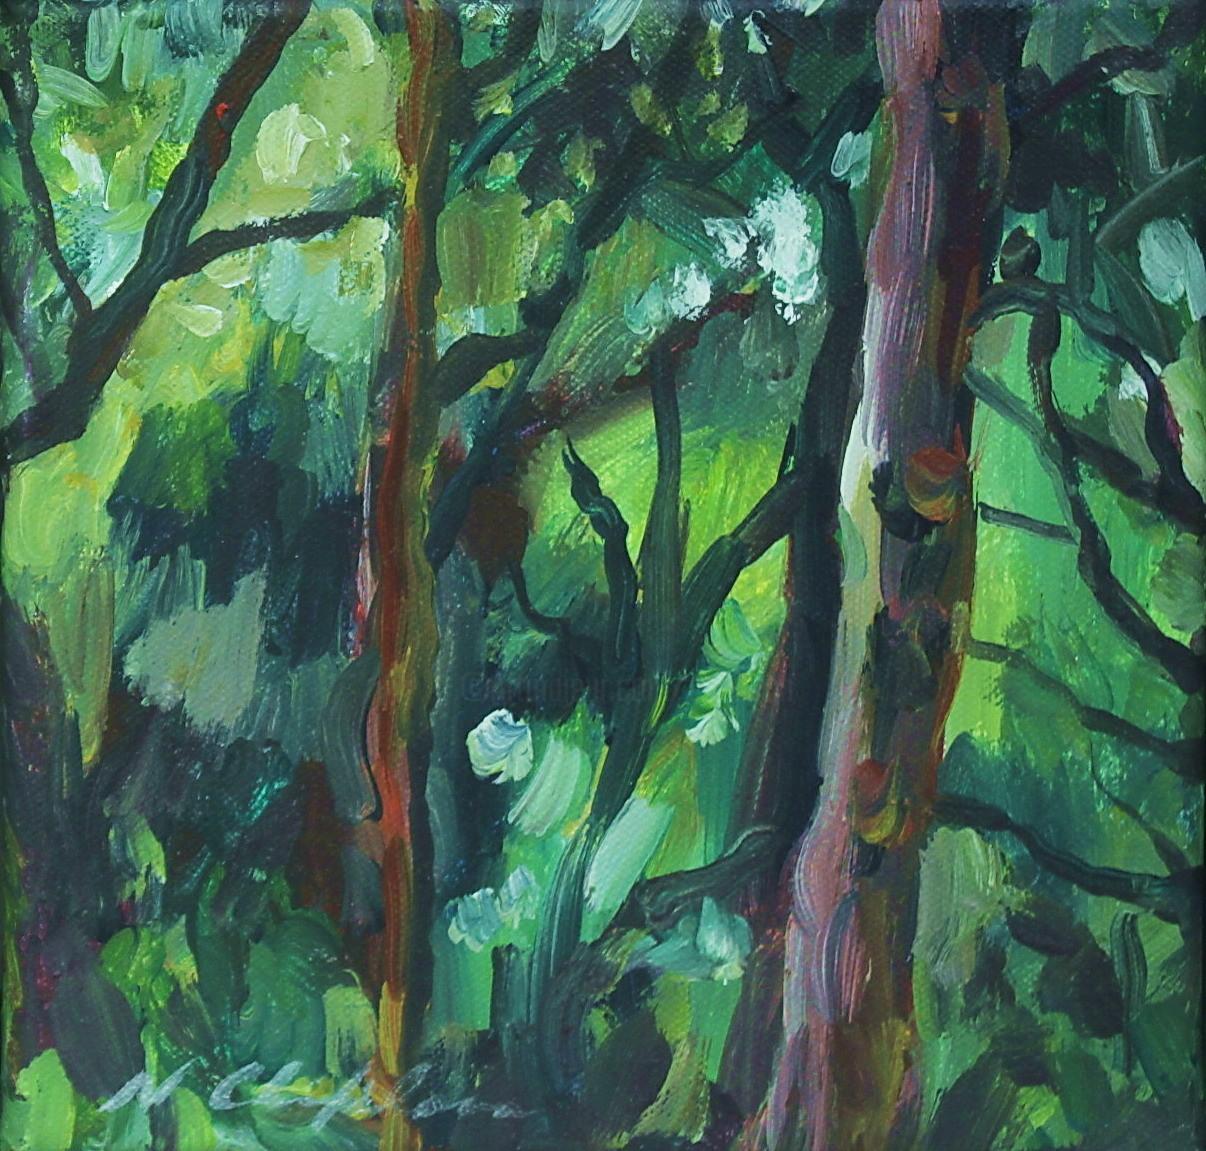 Nath Chipilova (Atelier NN art store) - Into the wood 2